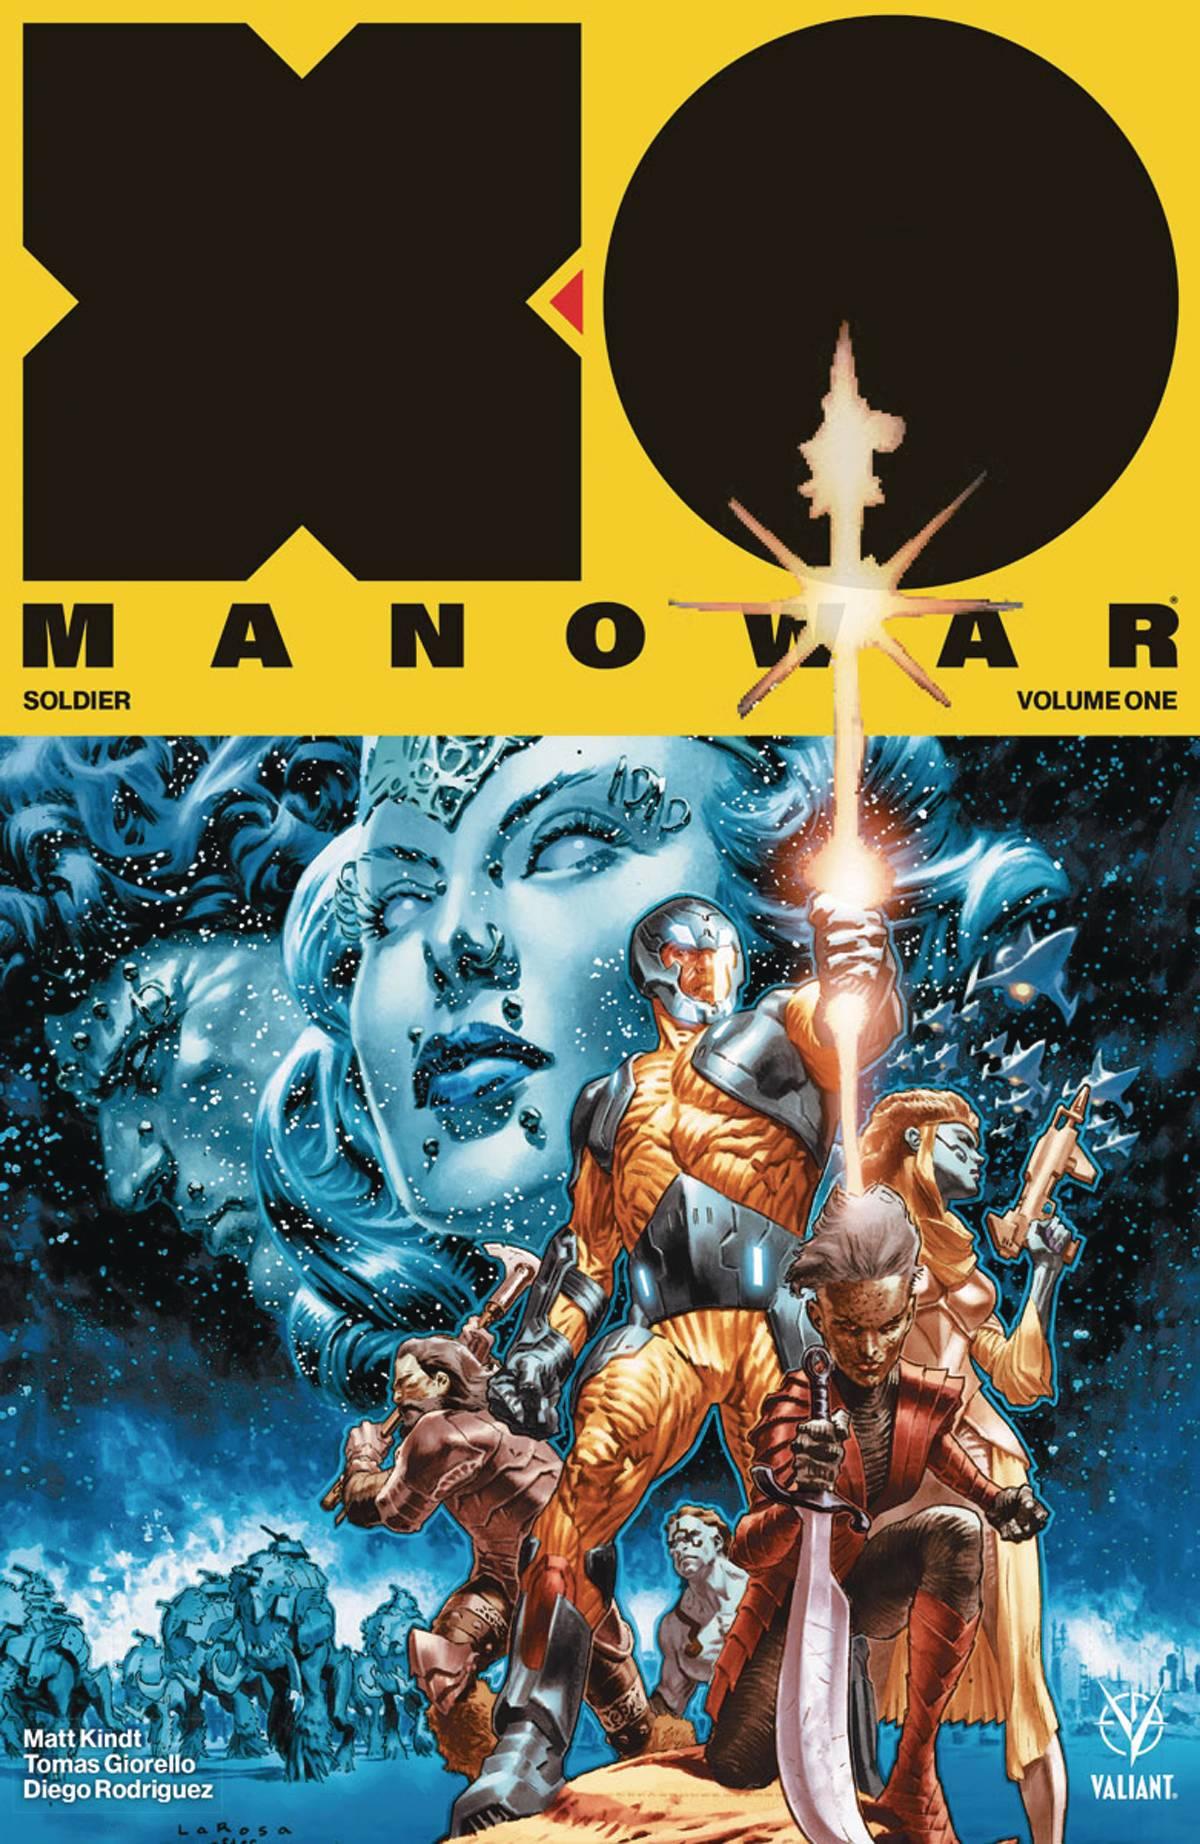 X-O Manowar 2017 Vol 1 Soldier TPB